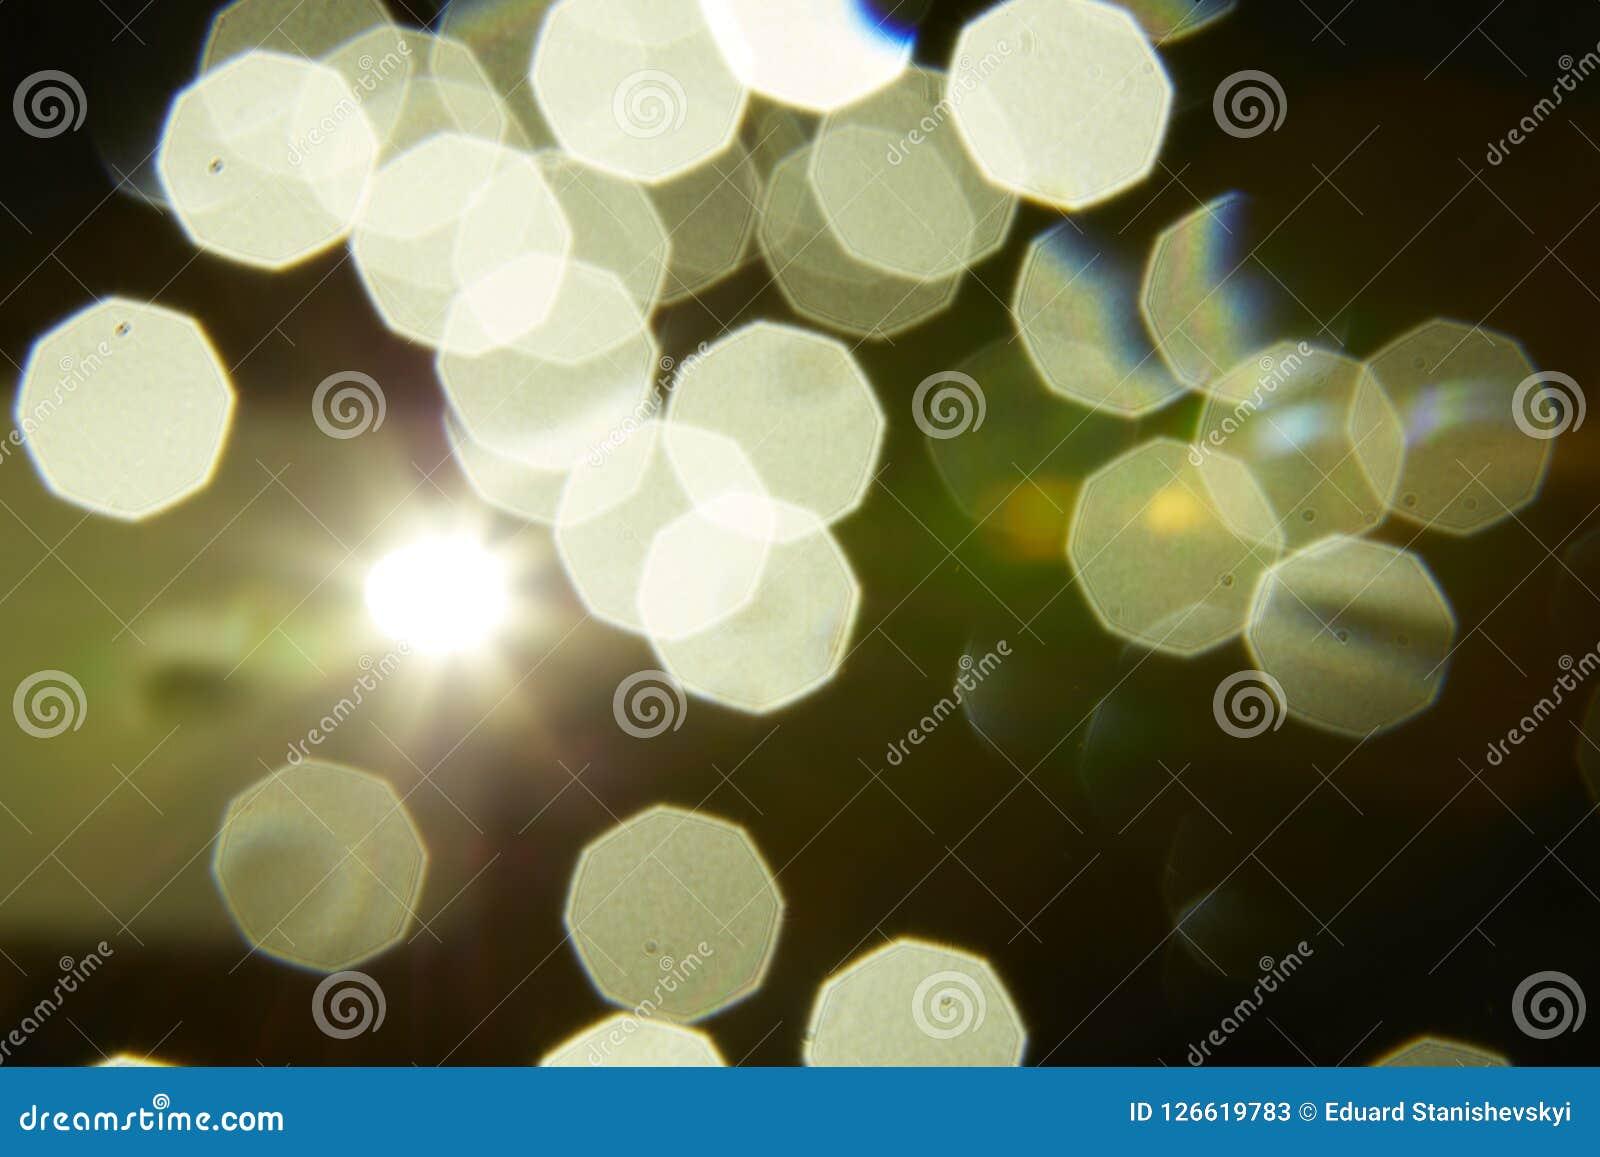 Bokeh samkopiering med ljus